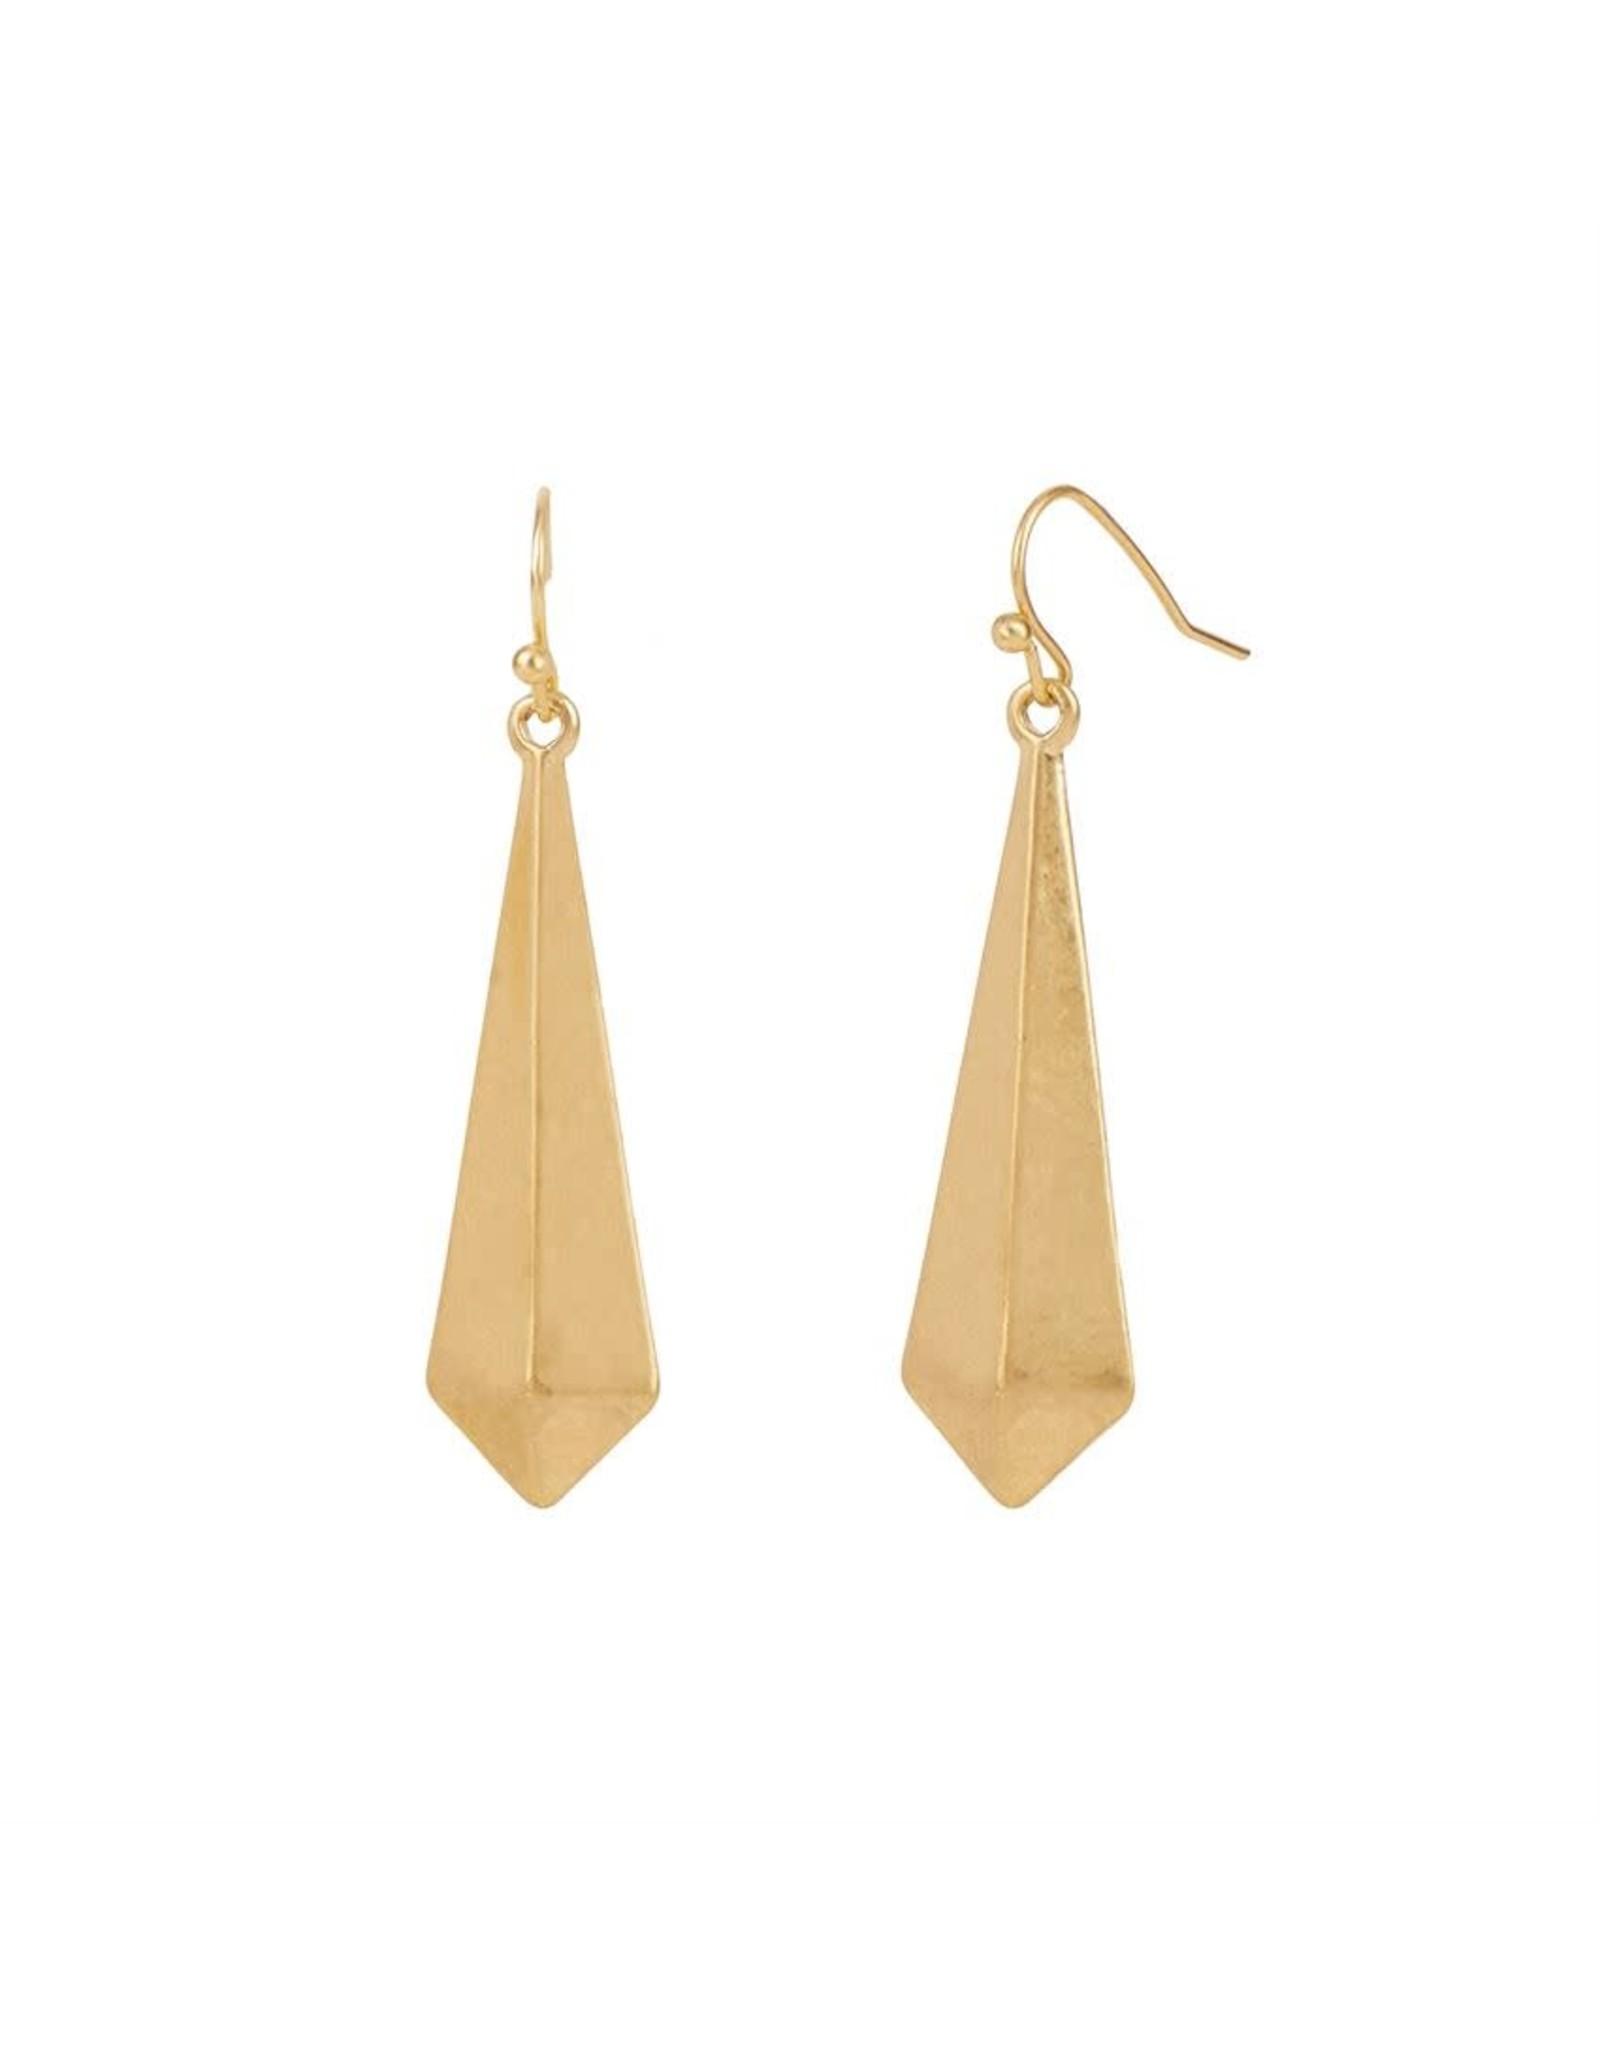 TGB / Good Bead 3D TRIANGLE EARRINGS GOLD